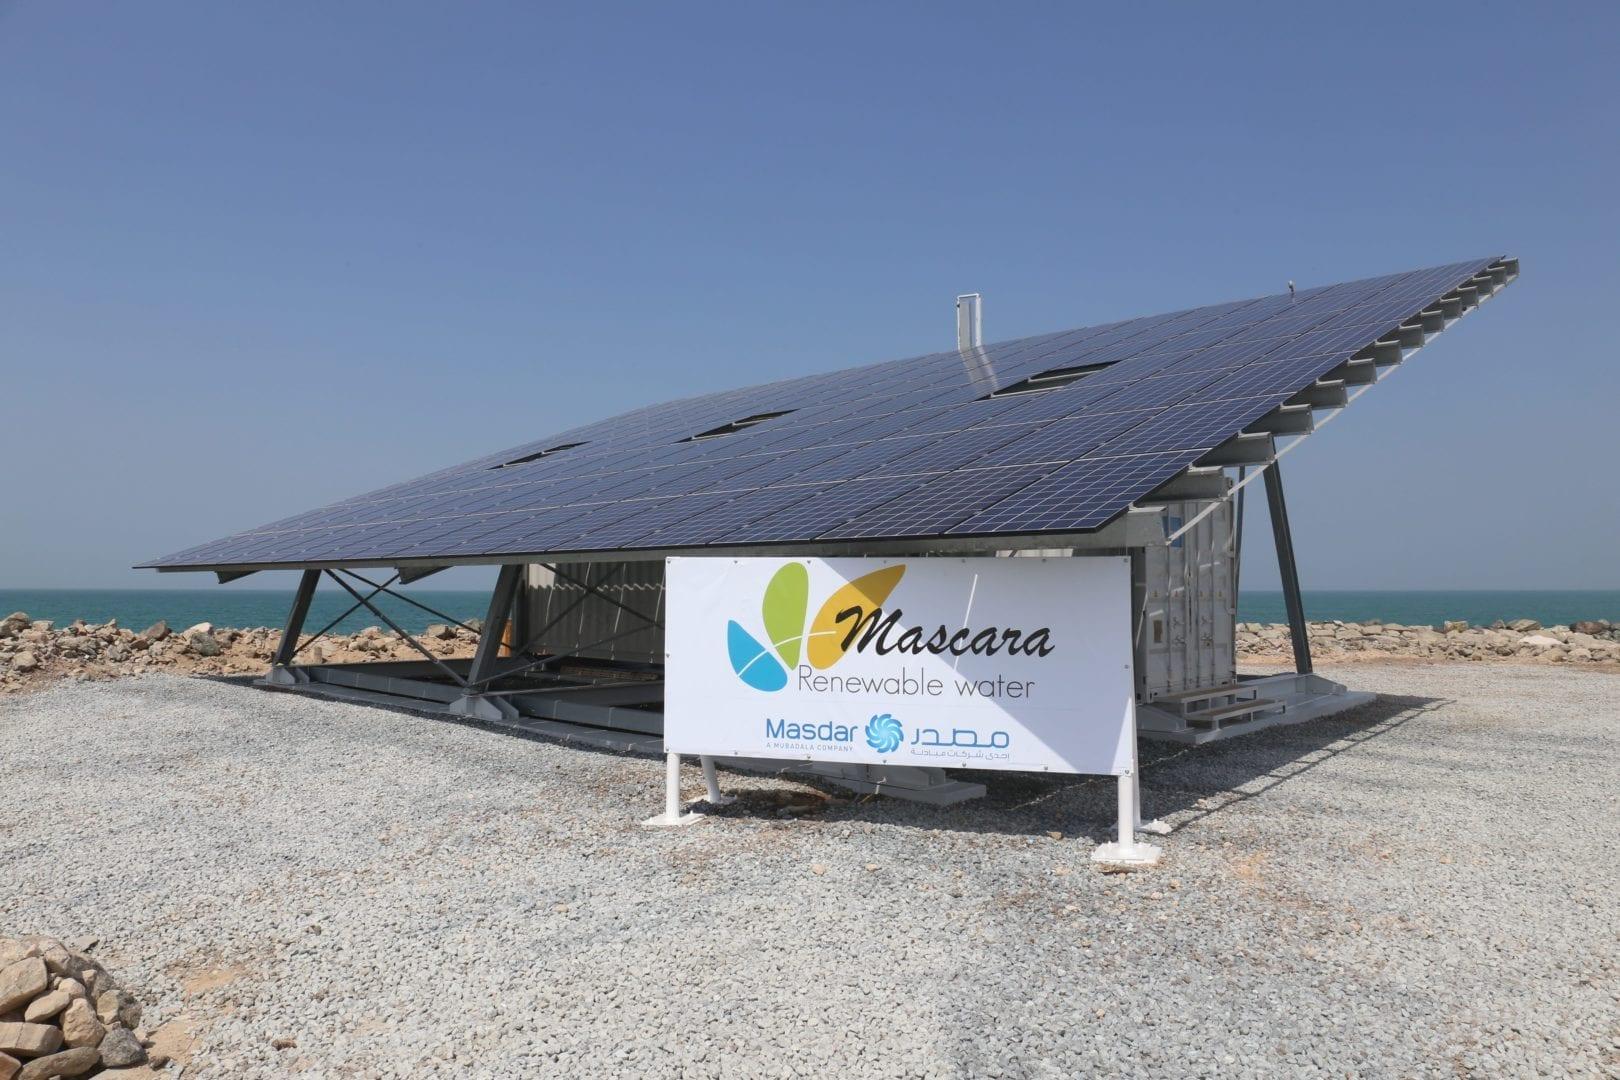 Partnership brings first solar powered desalination plant to SA